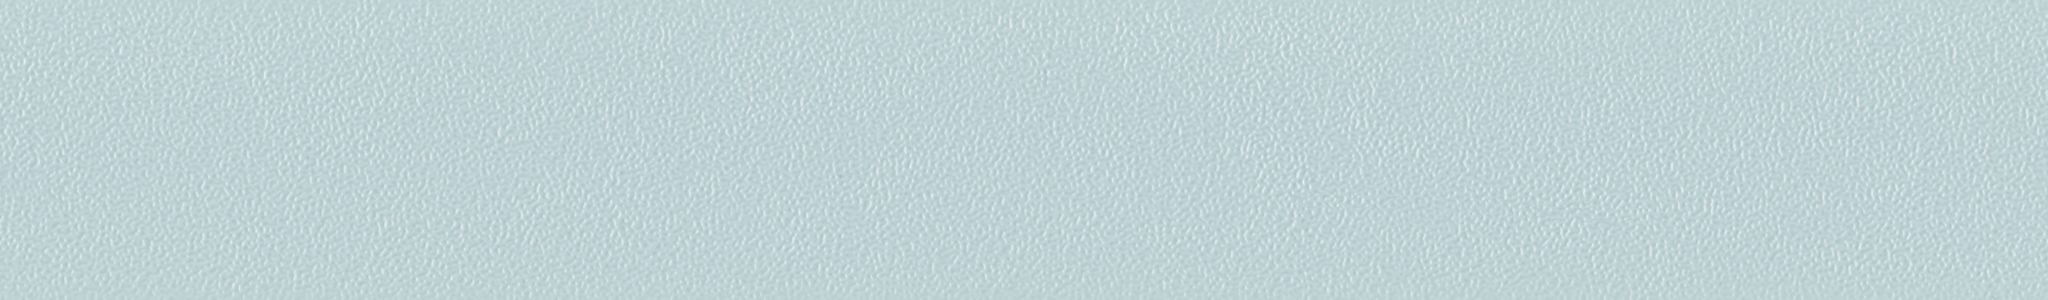 HU 153271 ABS Kante UNI Eis Blau perl 101